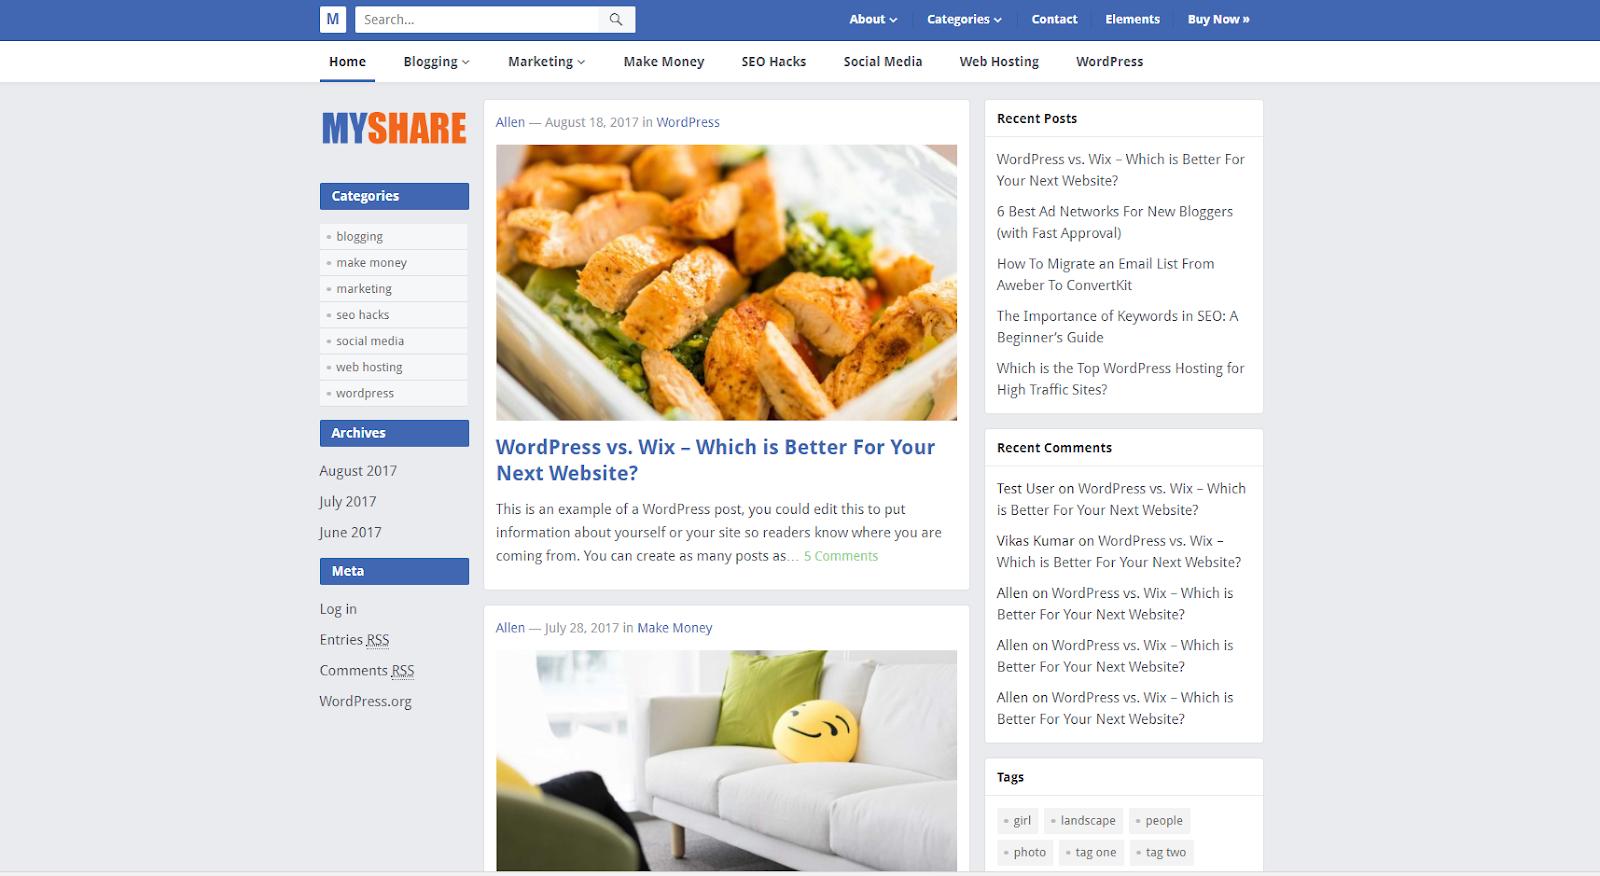 Share Giao Diện MyShare Cá Nhân Giống Facebook